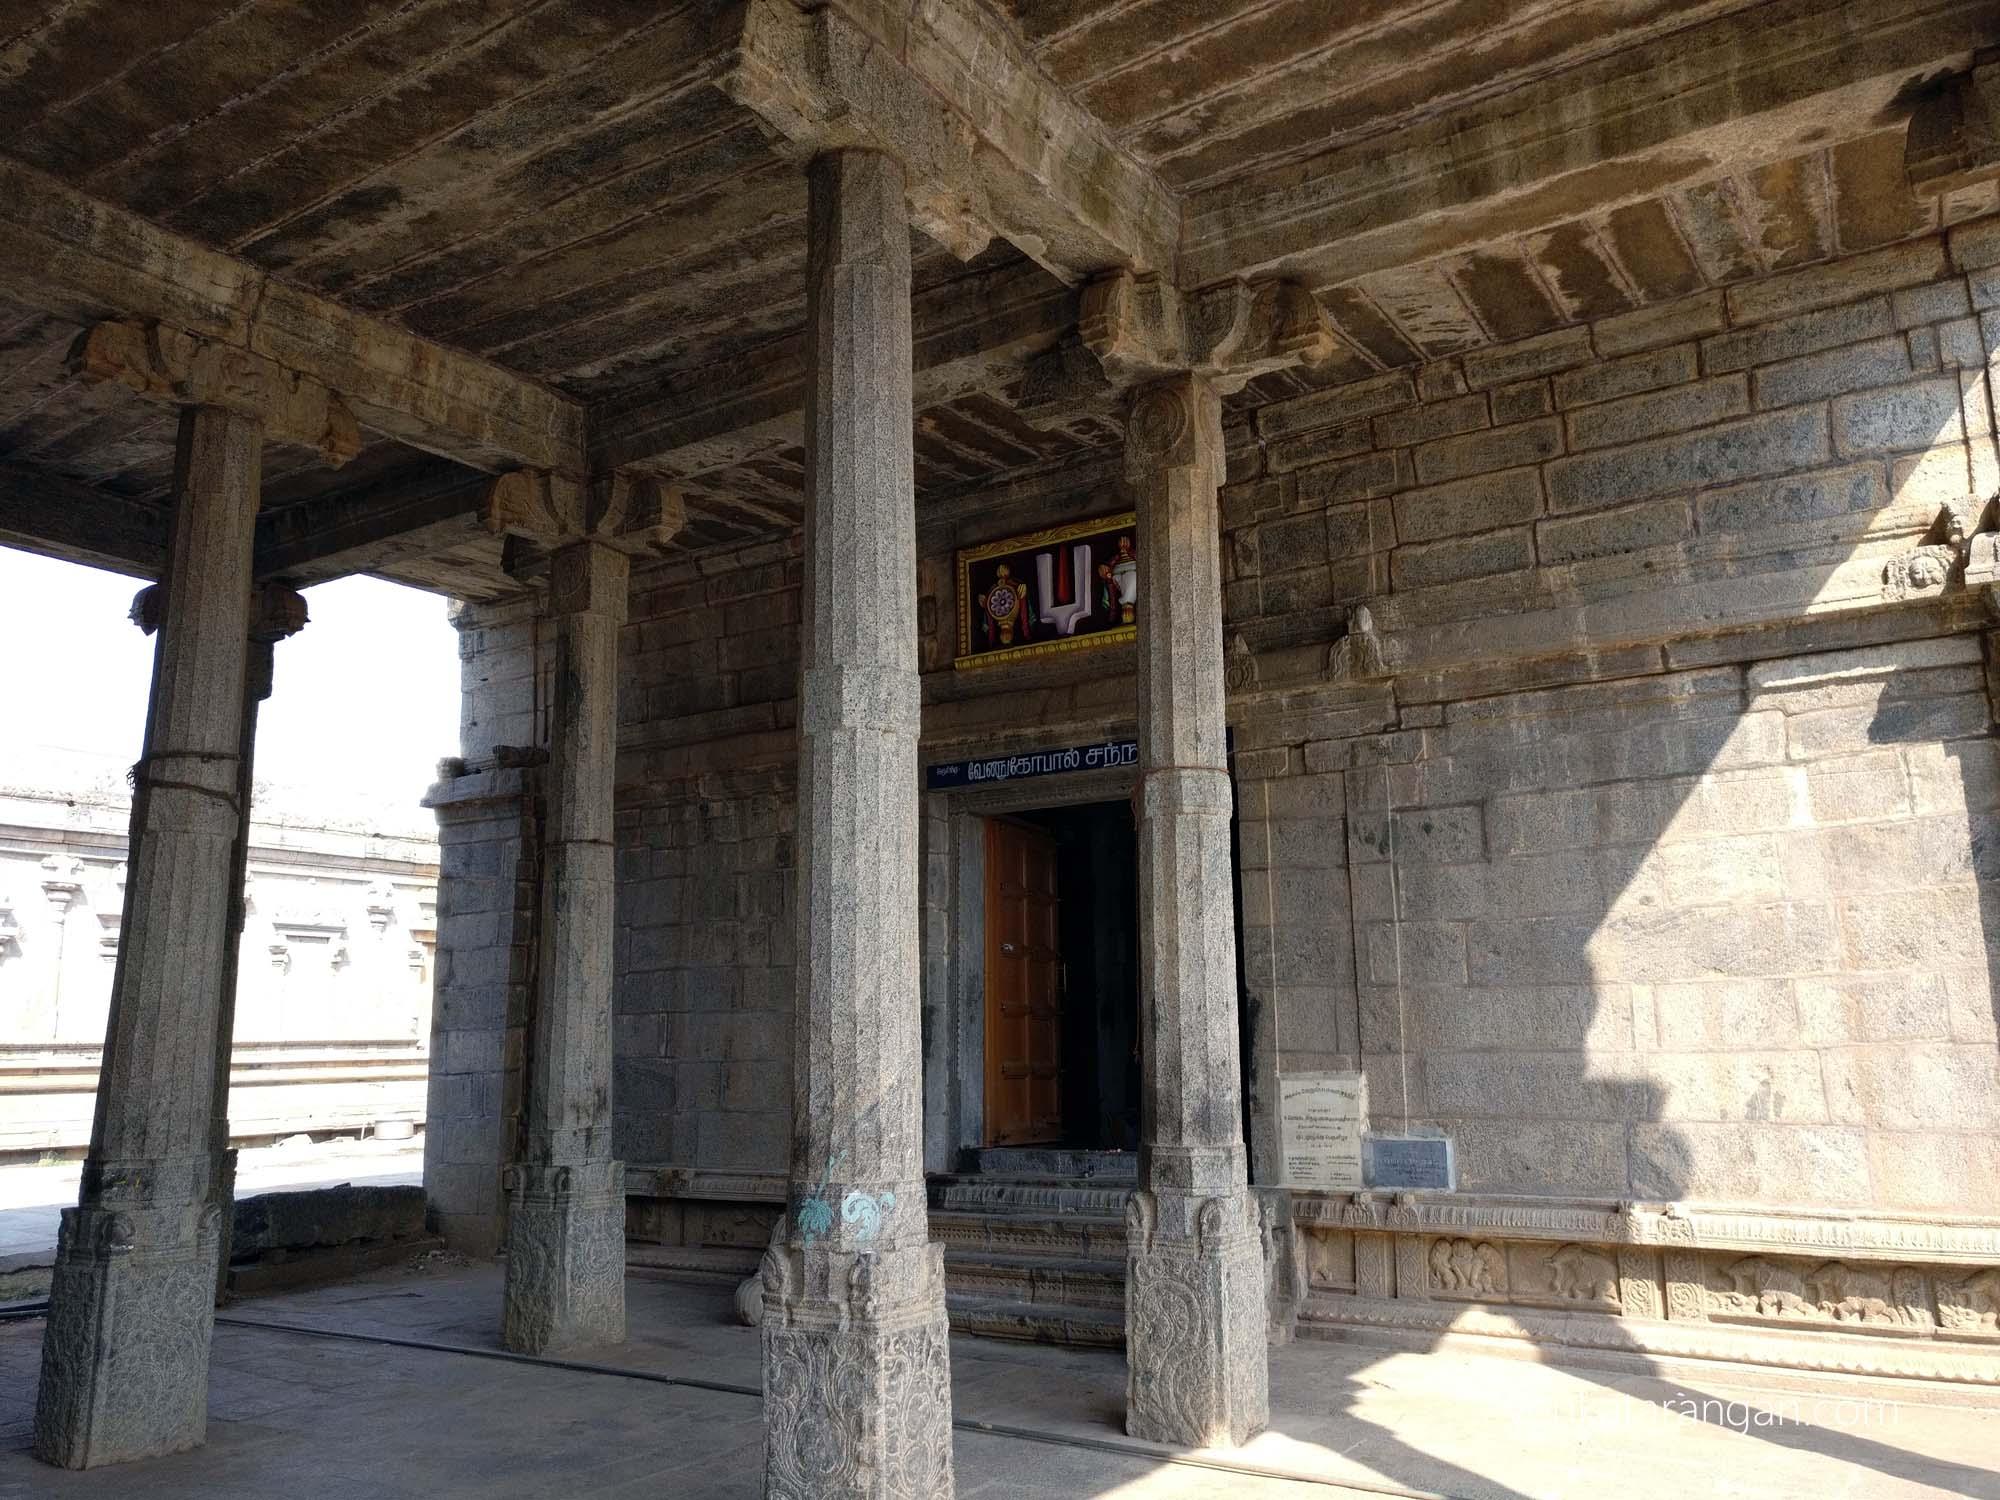 Sri Venugopal Sannidhi, Srimushnam